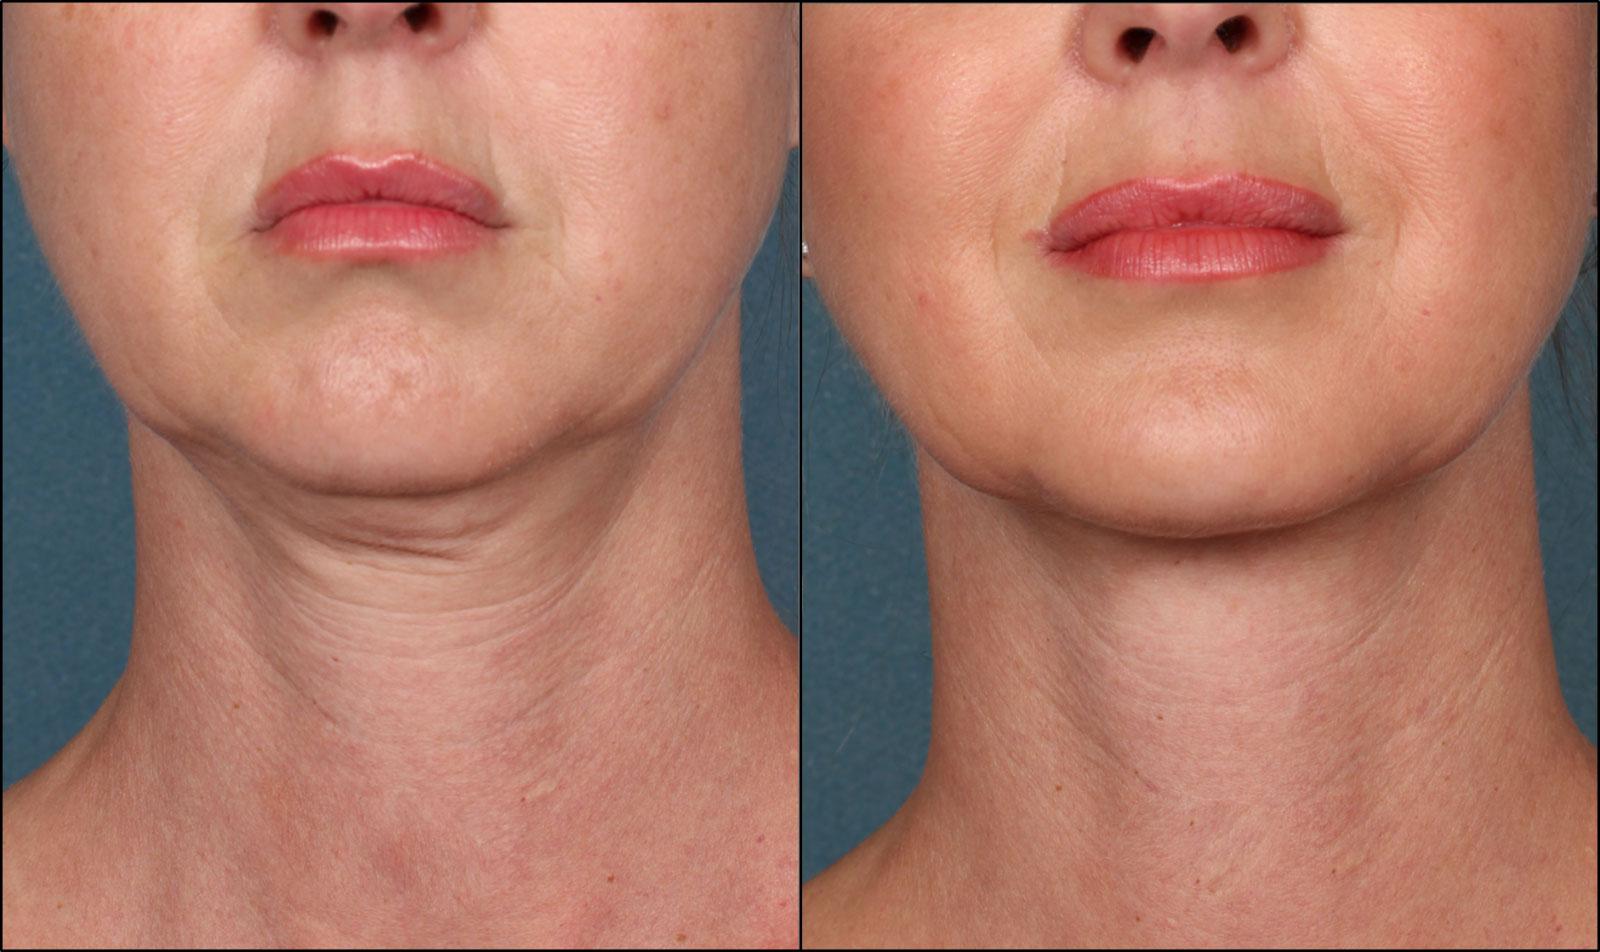 Reasons to Consider Noninvasive Skin Tightening Procedures